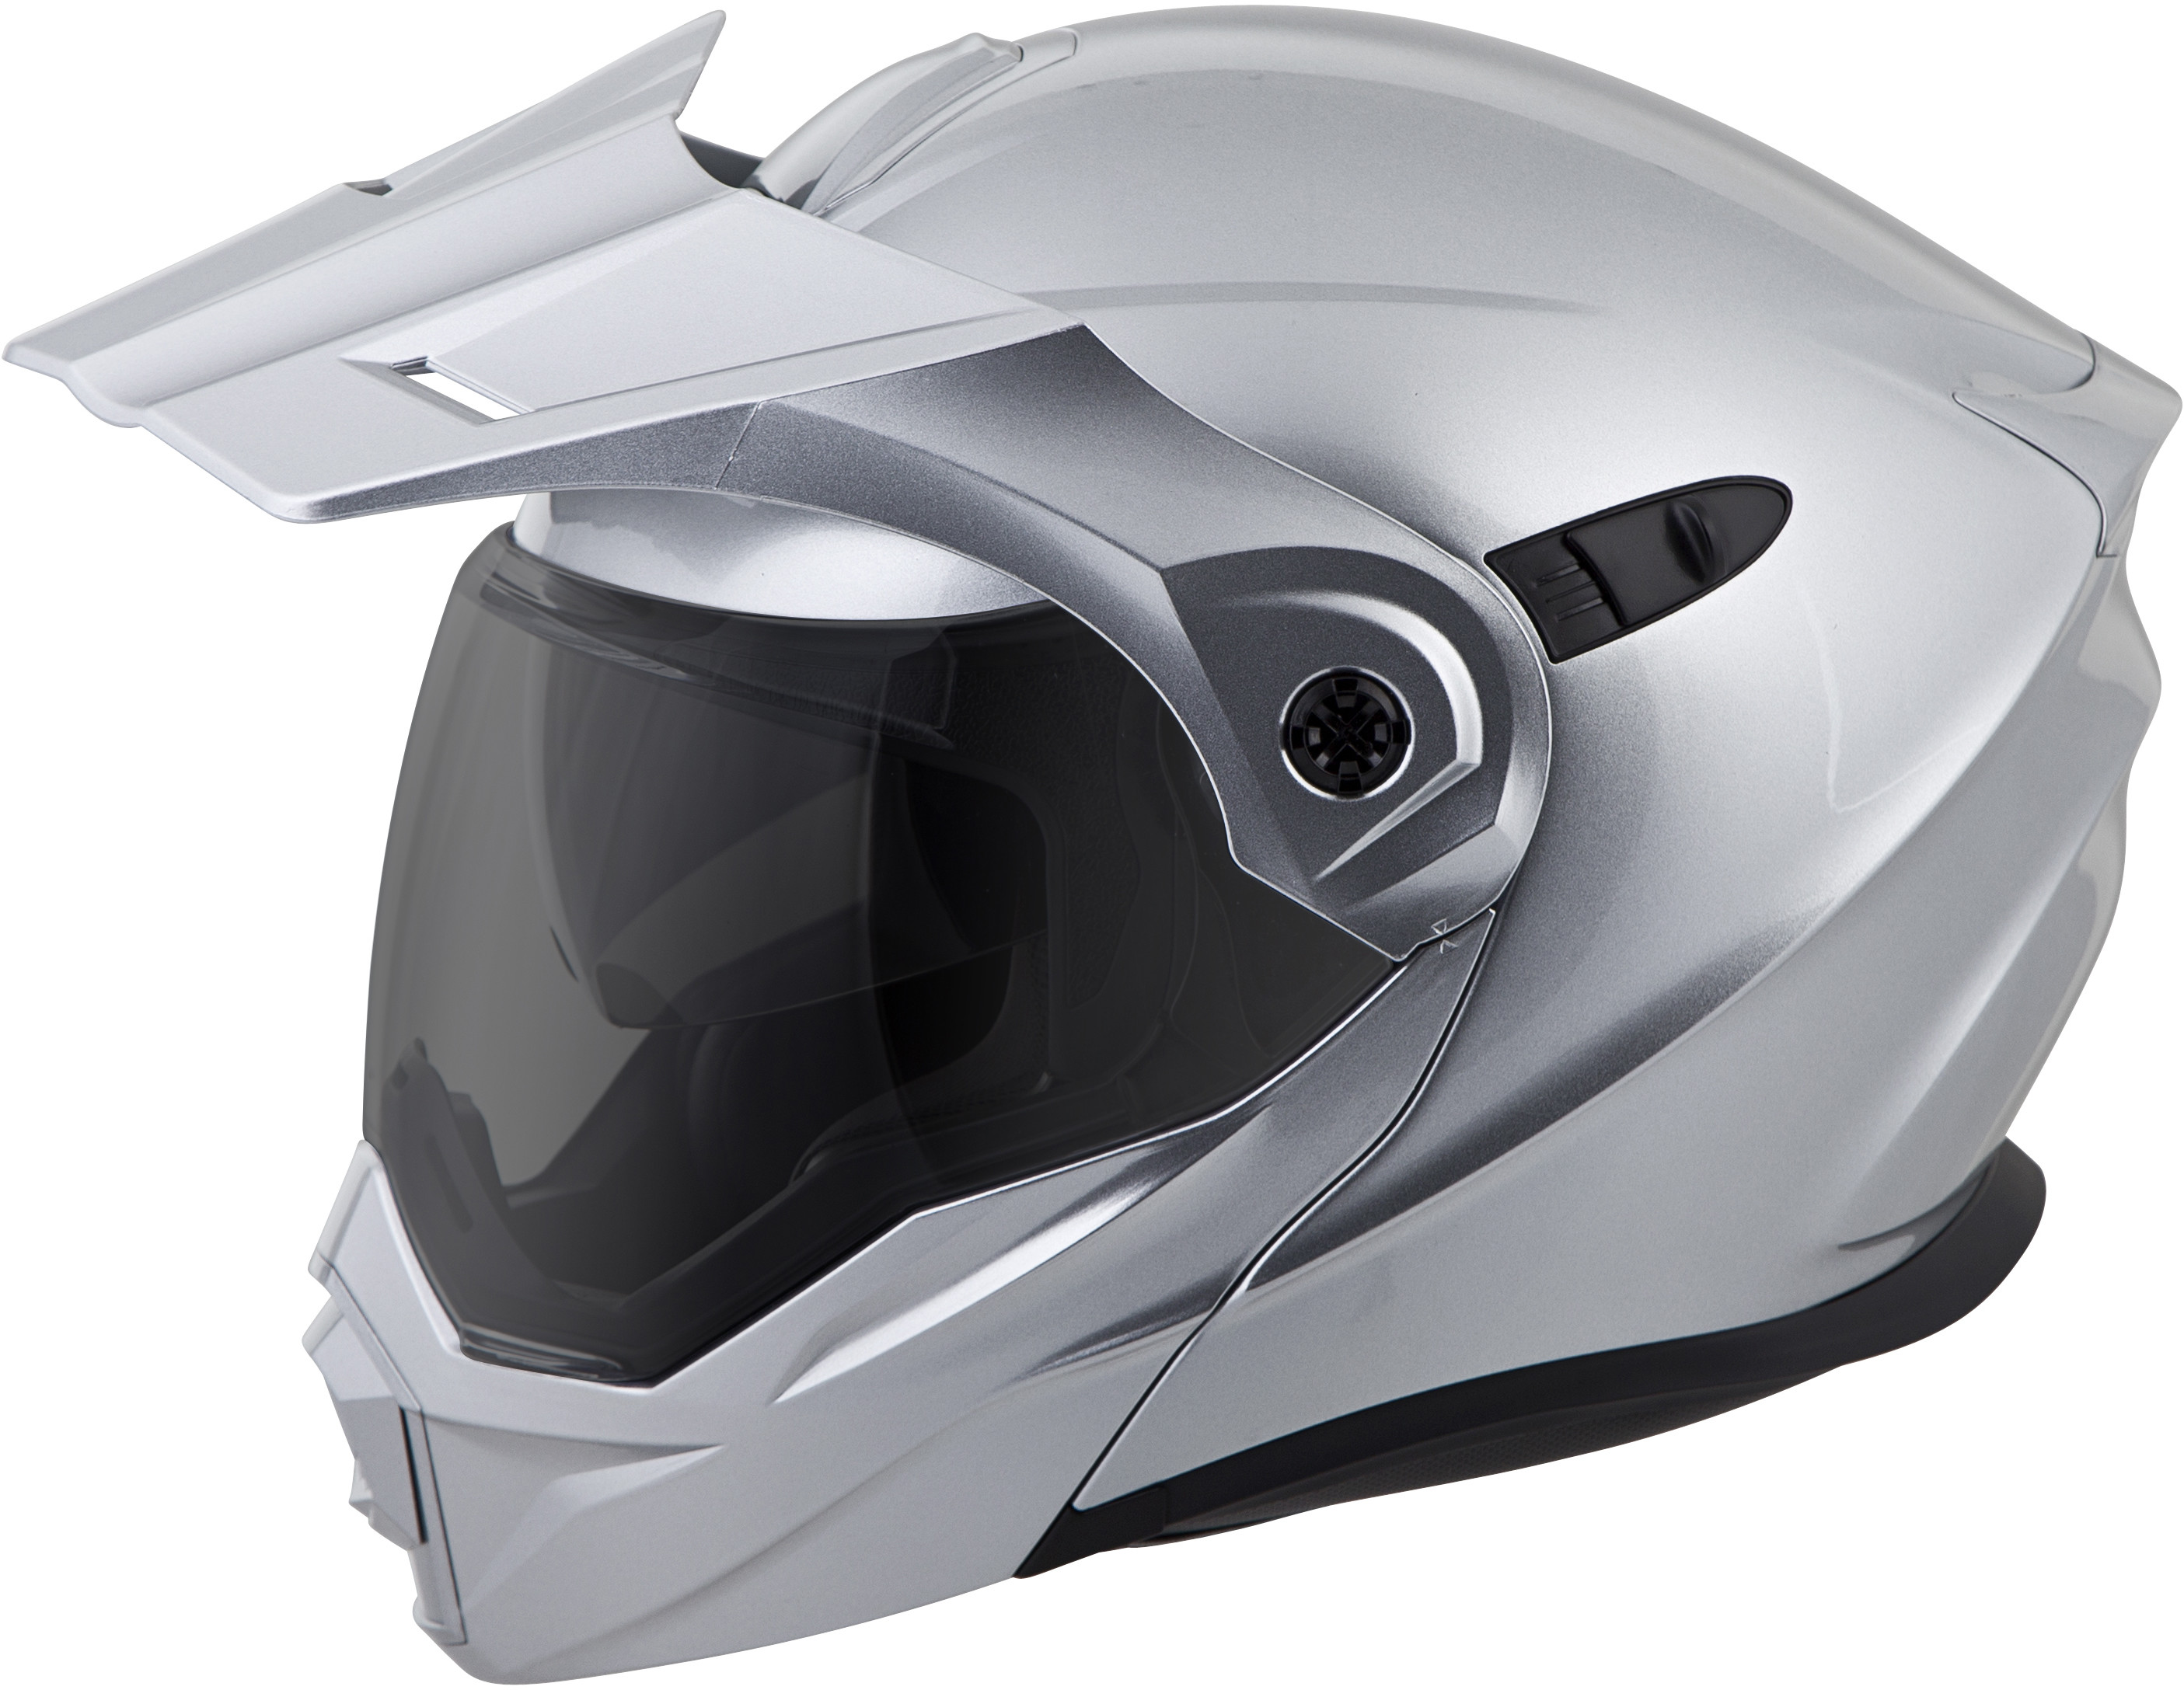 Scorpion-Helmet-EXO-AT950-Solid-Helmet miniature 6